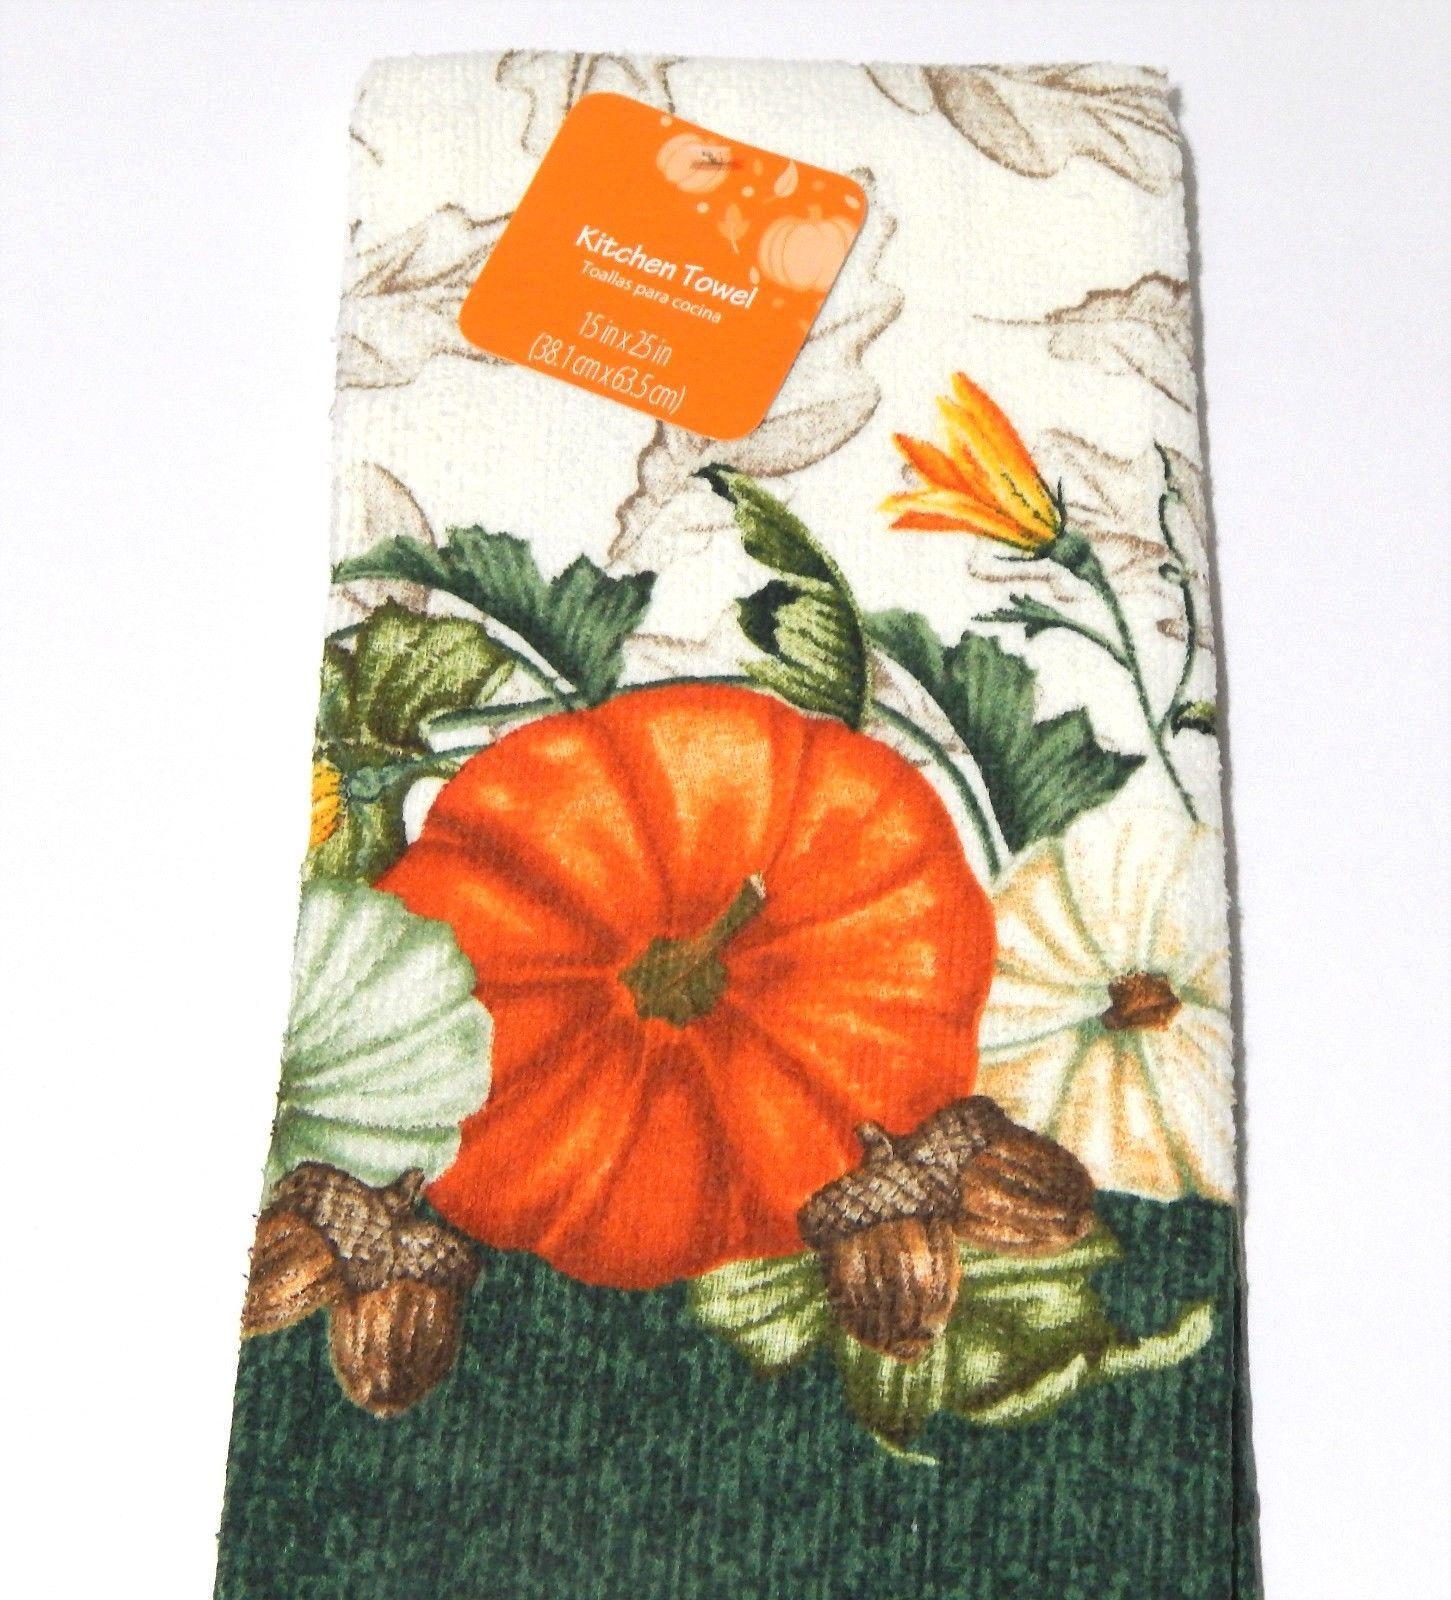 Fall Autumn Harvest Thanksgiving Kitchen Dish Towel Oven Mitt Set Pumpkin Acorn